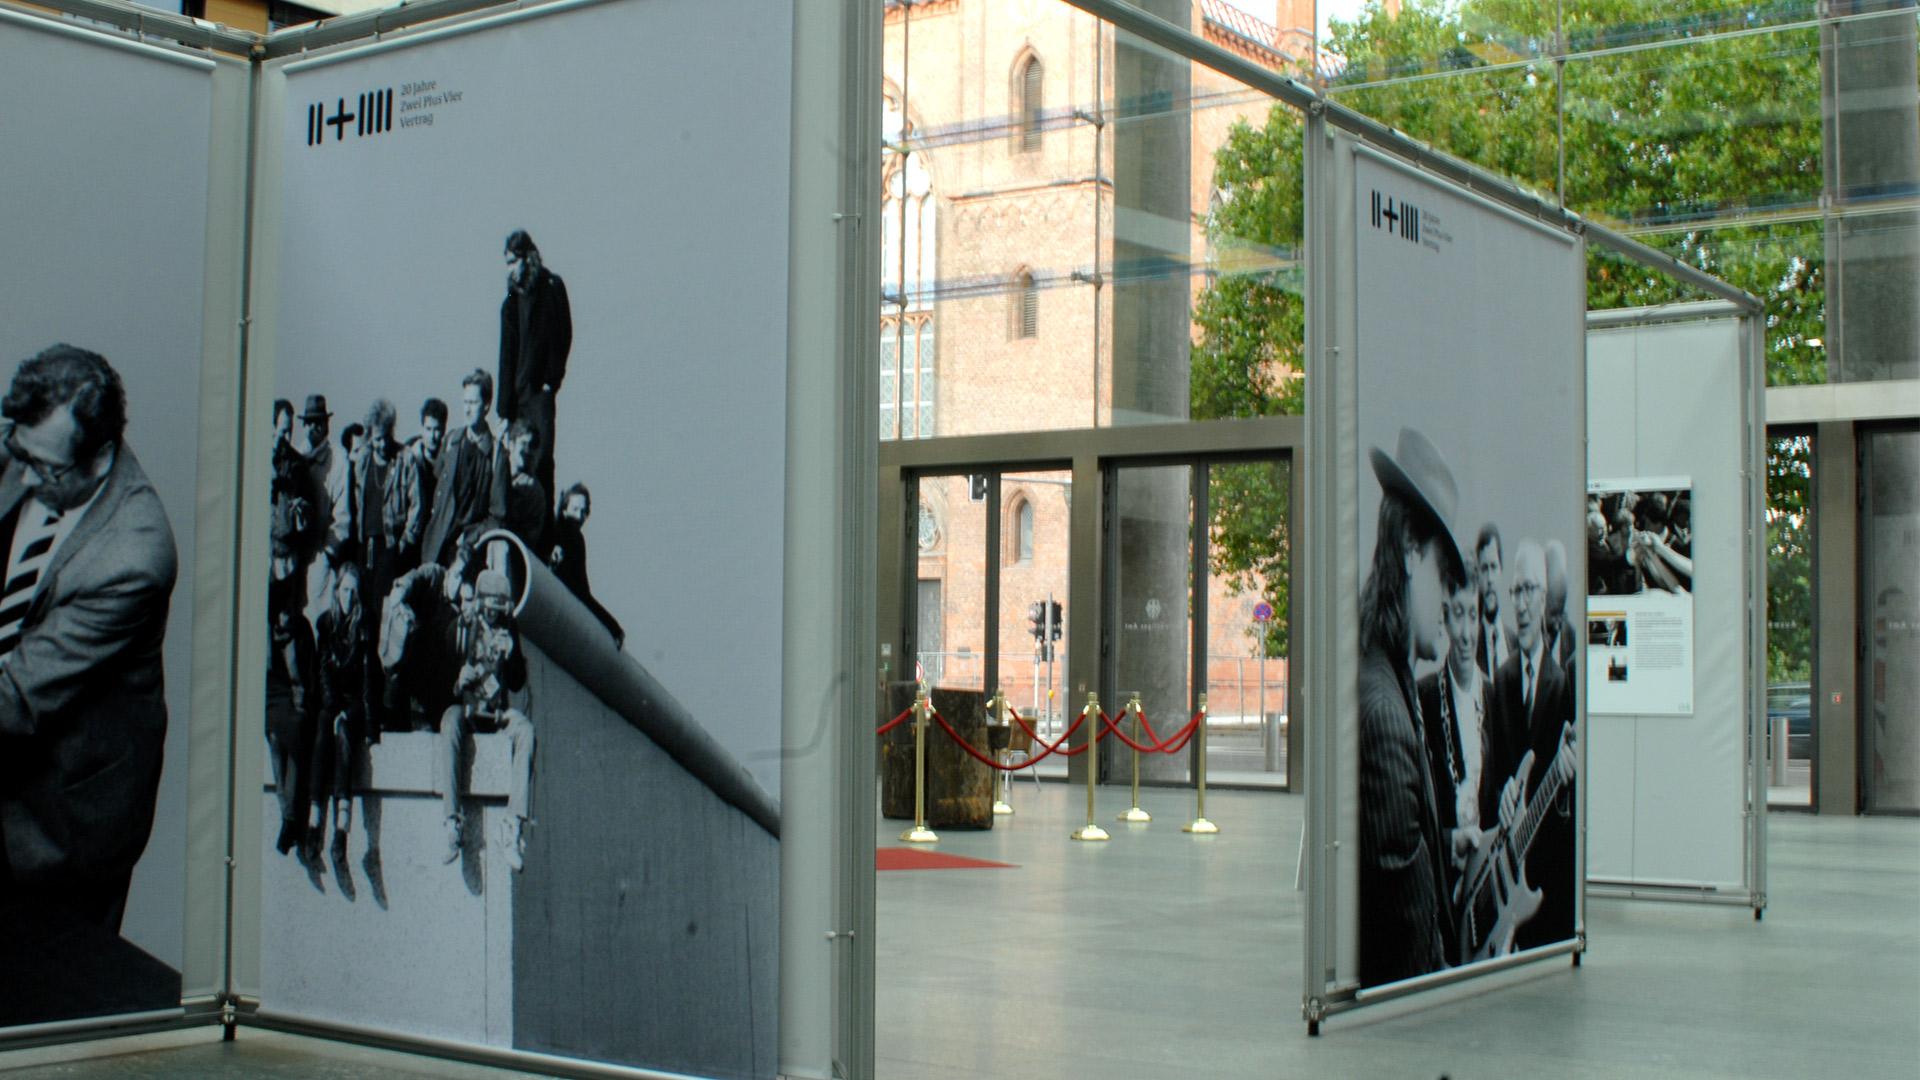 Ausstellung-AA-Matti-Michalke-Berlin-Brandenburg-Aussenwerbung-Innenwerbung-Banner-Planen-Folien-Werbemittel-Druck-Print